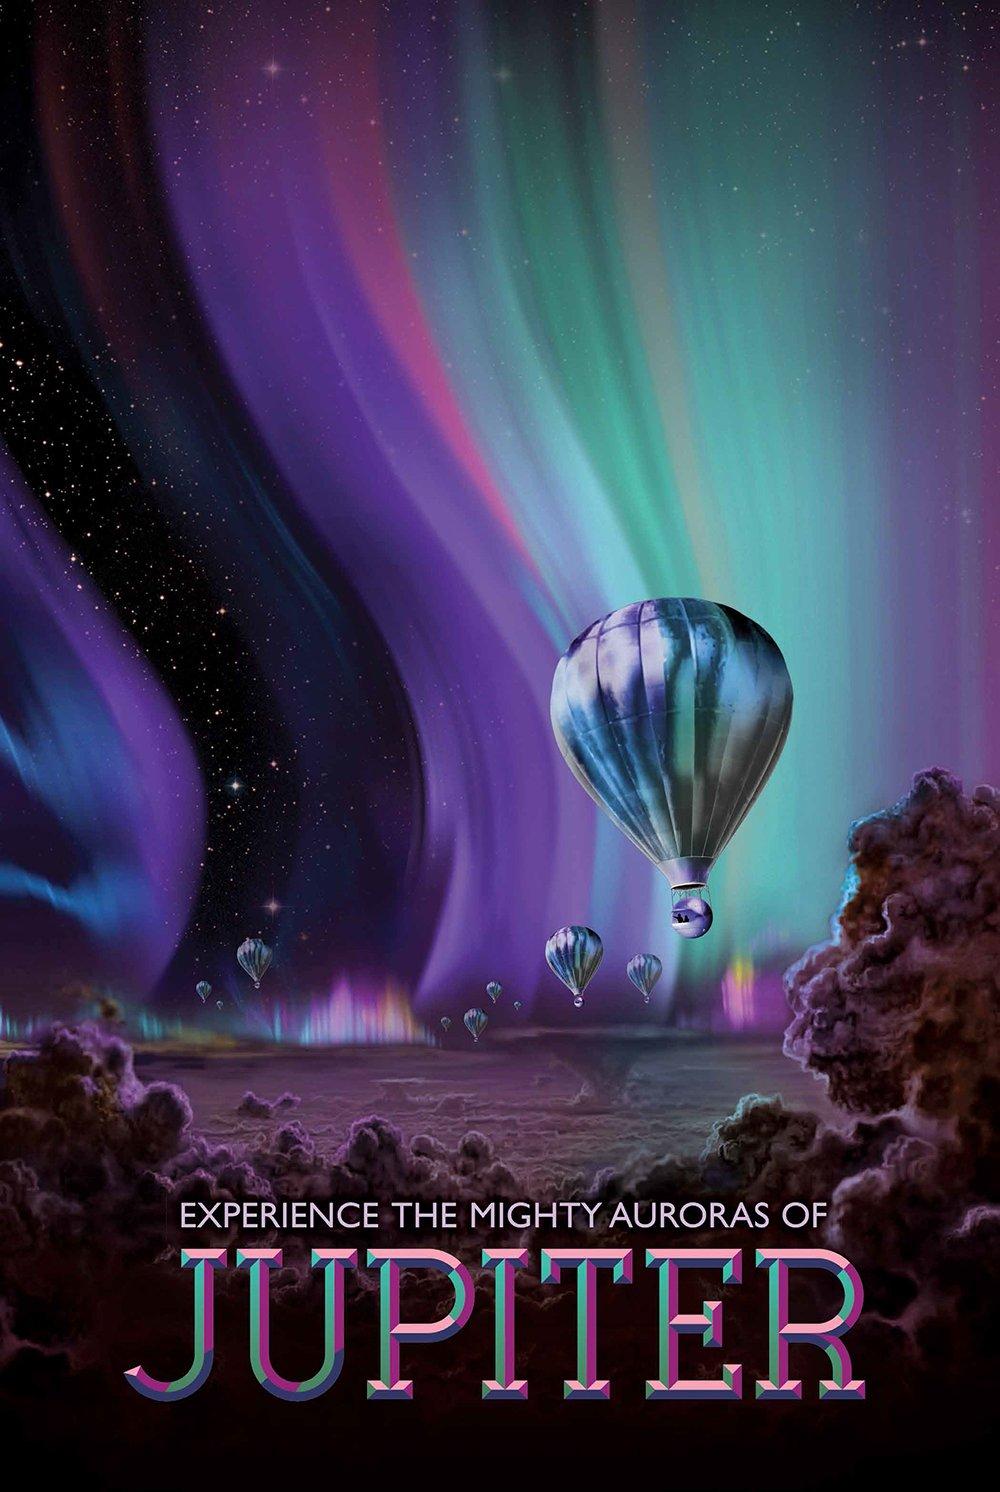 jupiter-NASA_POSTER-designplayground